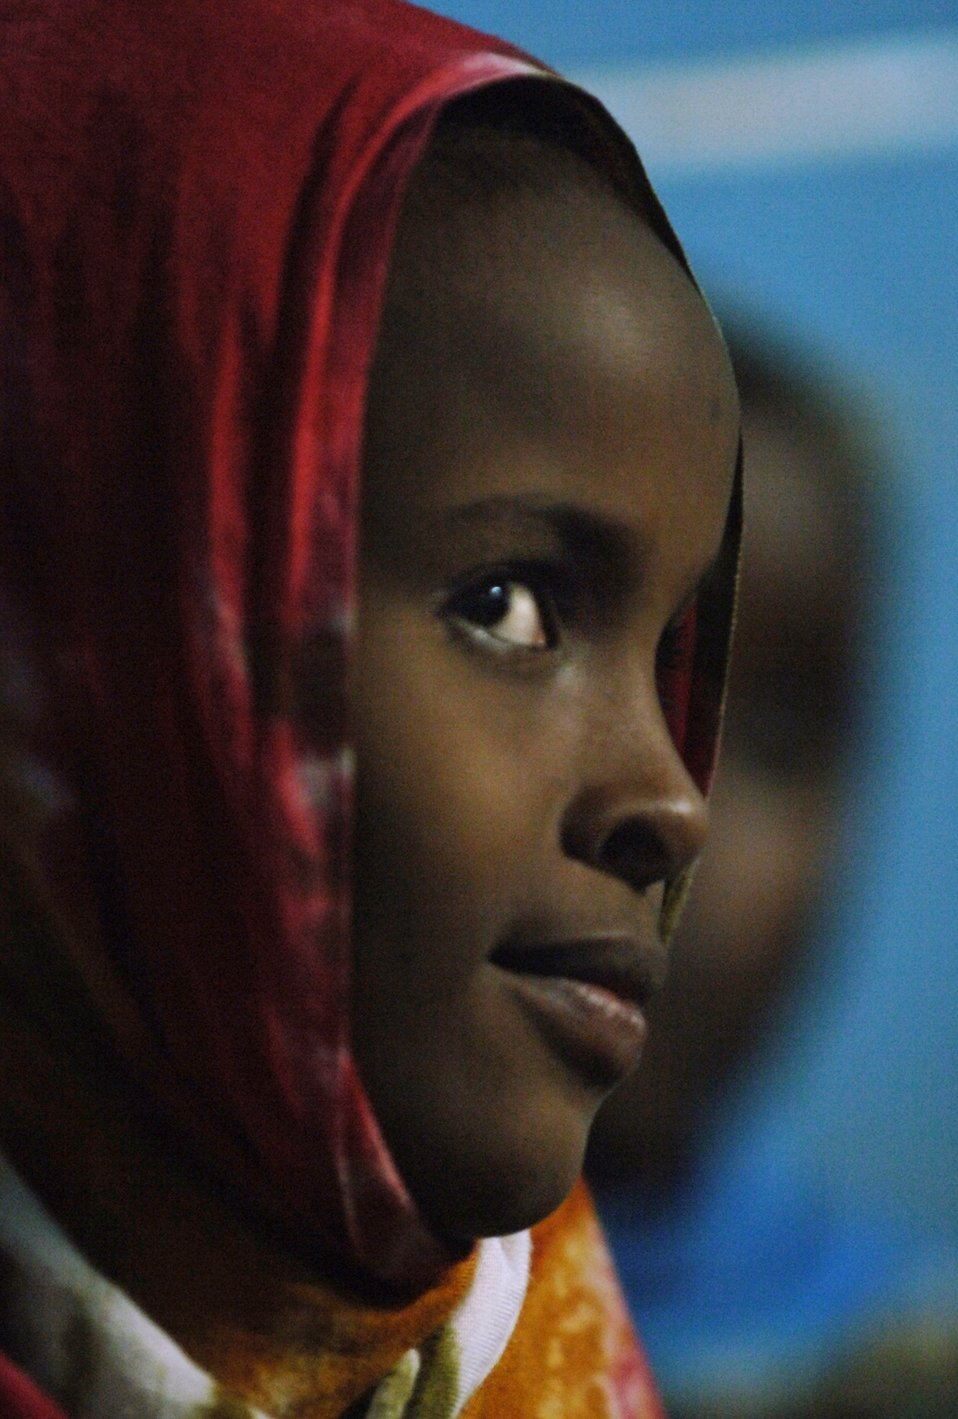 Americans, Djiboutians build relationships